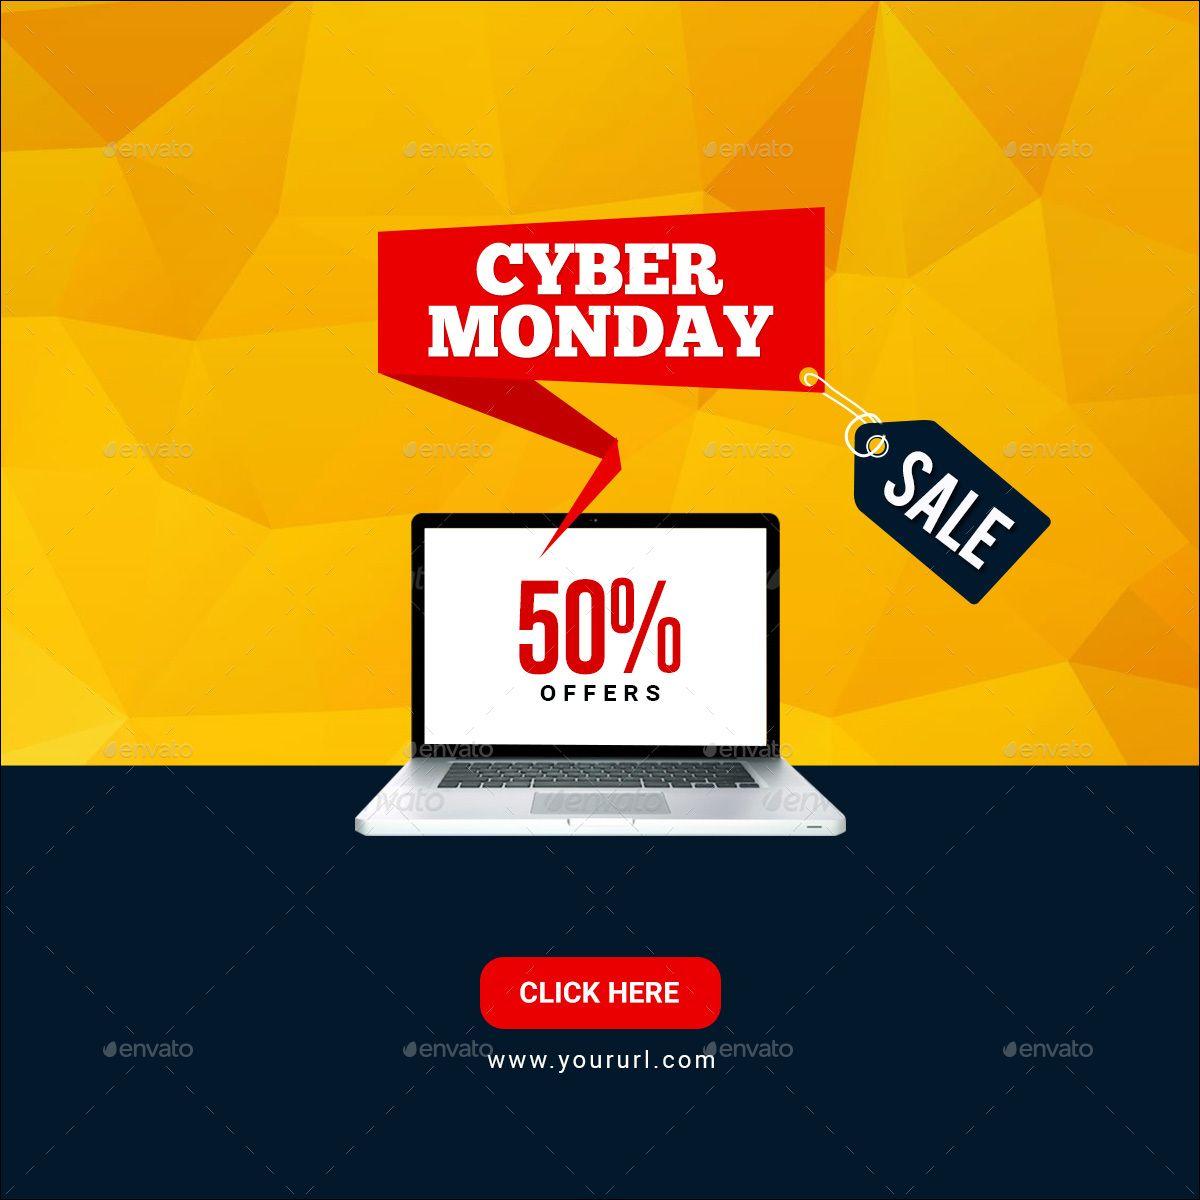 Cyber Monday Banners Bundle